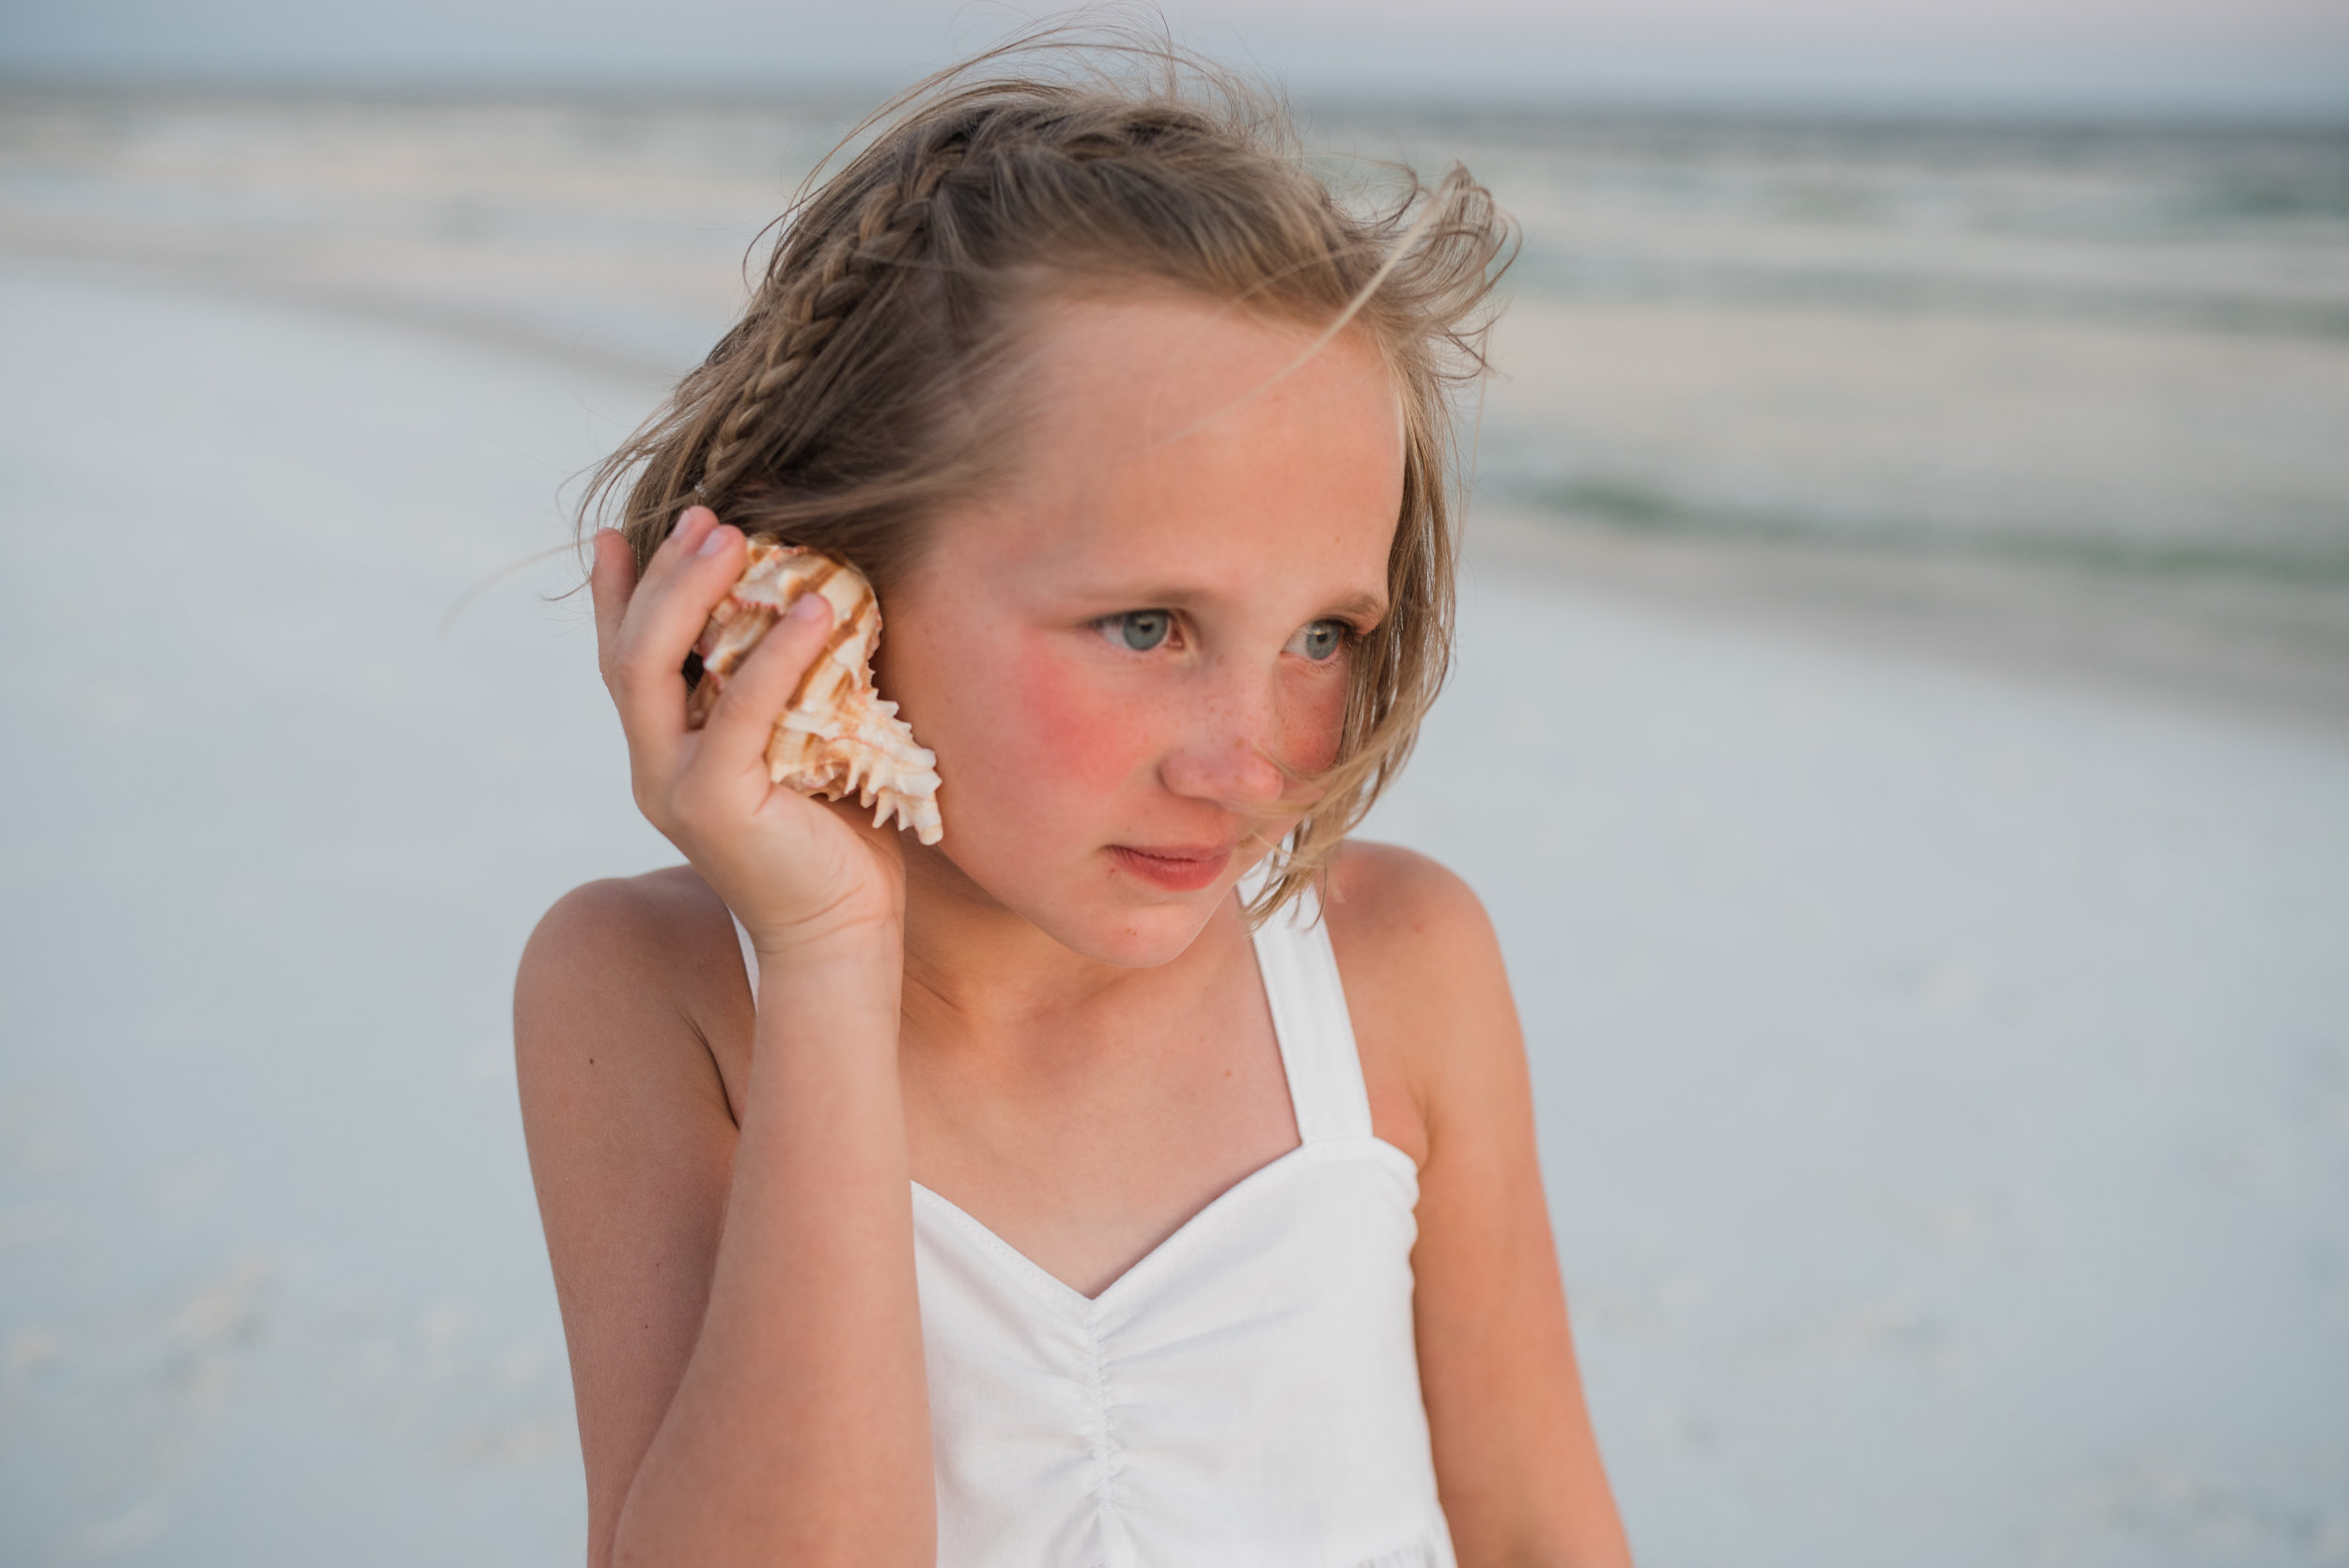 girl holding shell to ear-pensacola family photographer